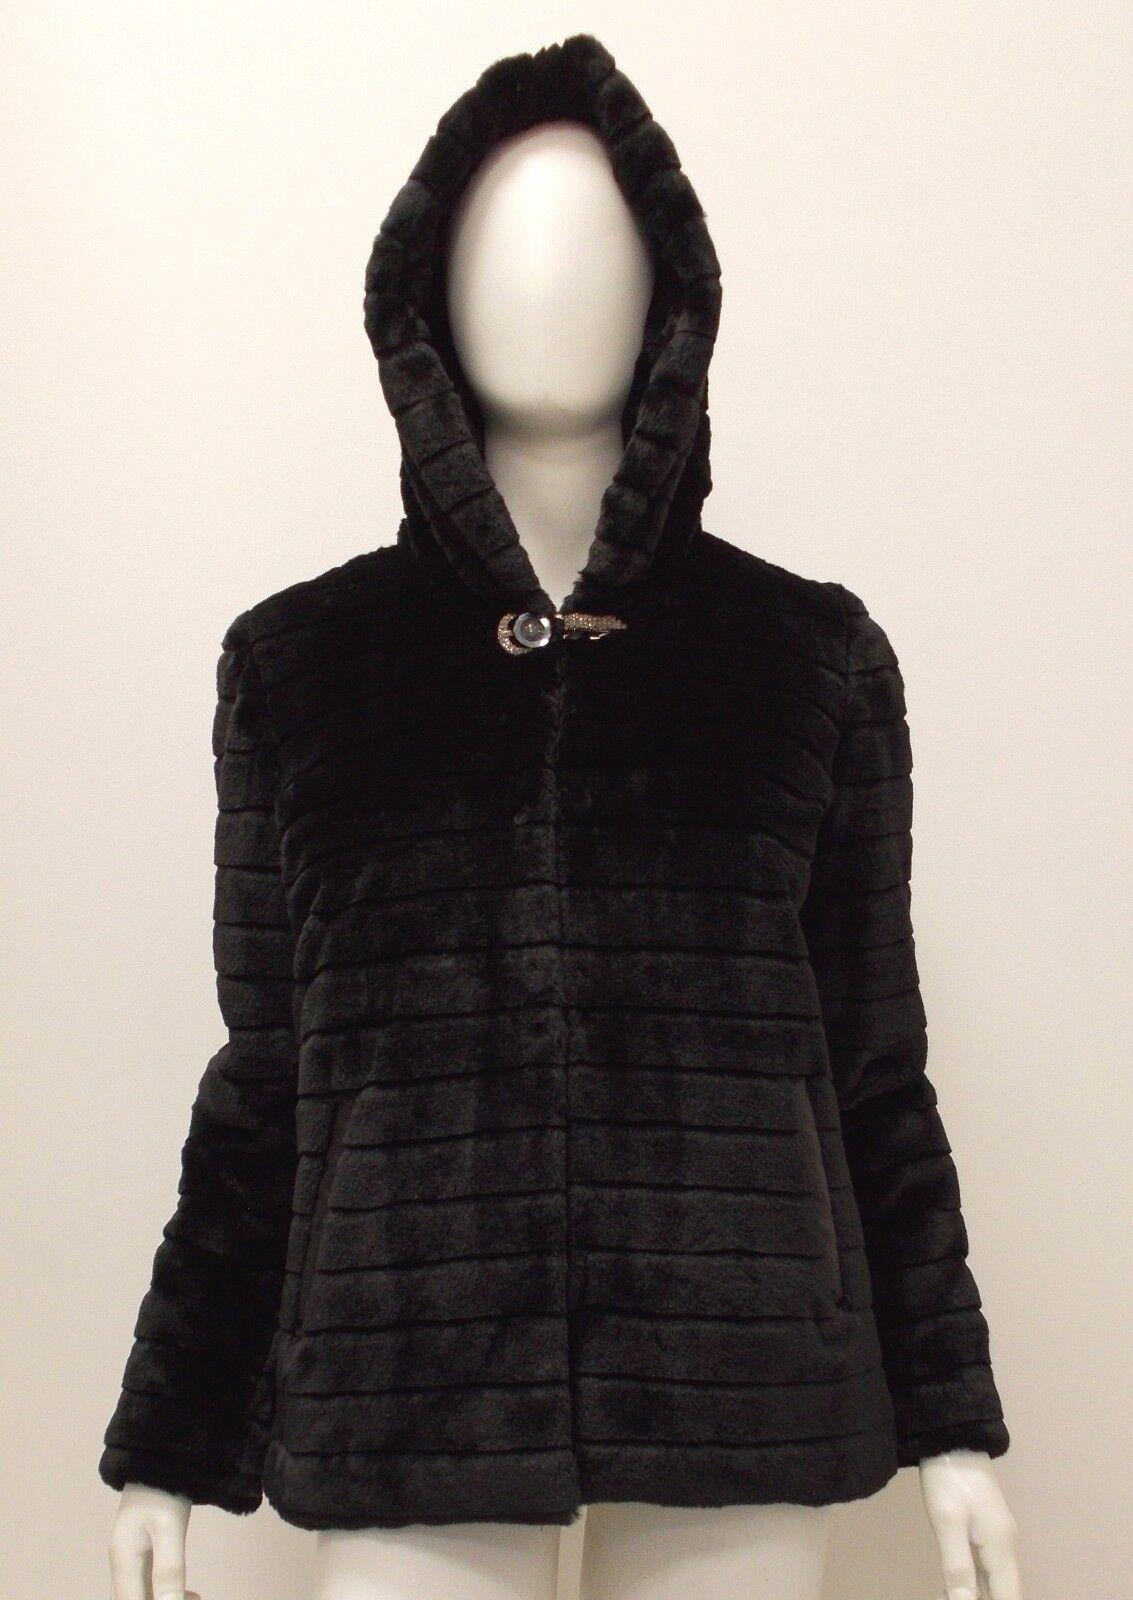 LIZALU' CURVY GIRL ECO PELLICCIA TAGLIE COMODE F458YAGMONACO color black FW2016